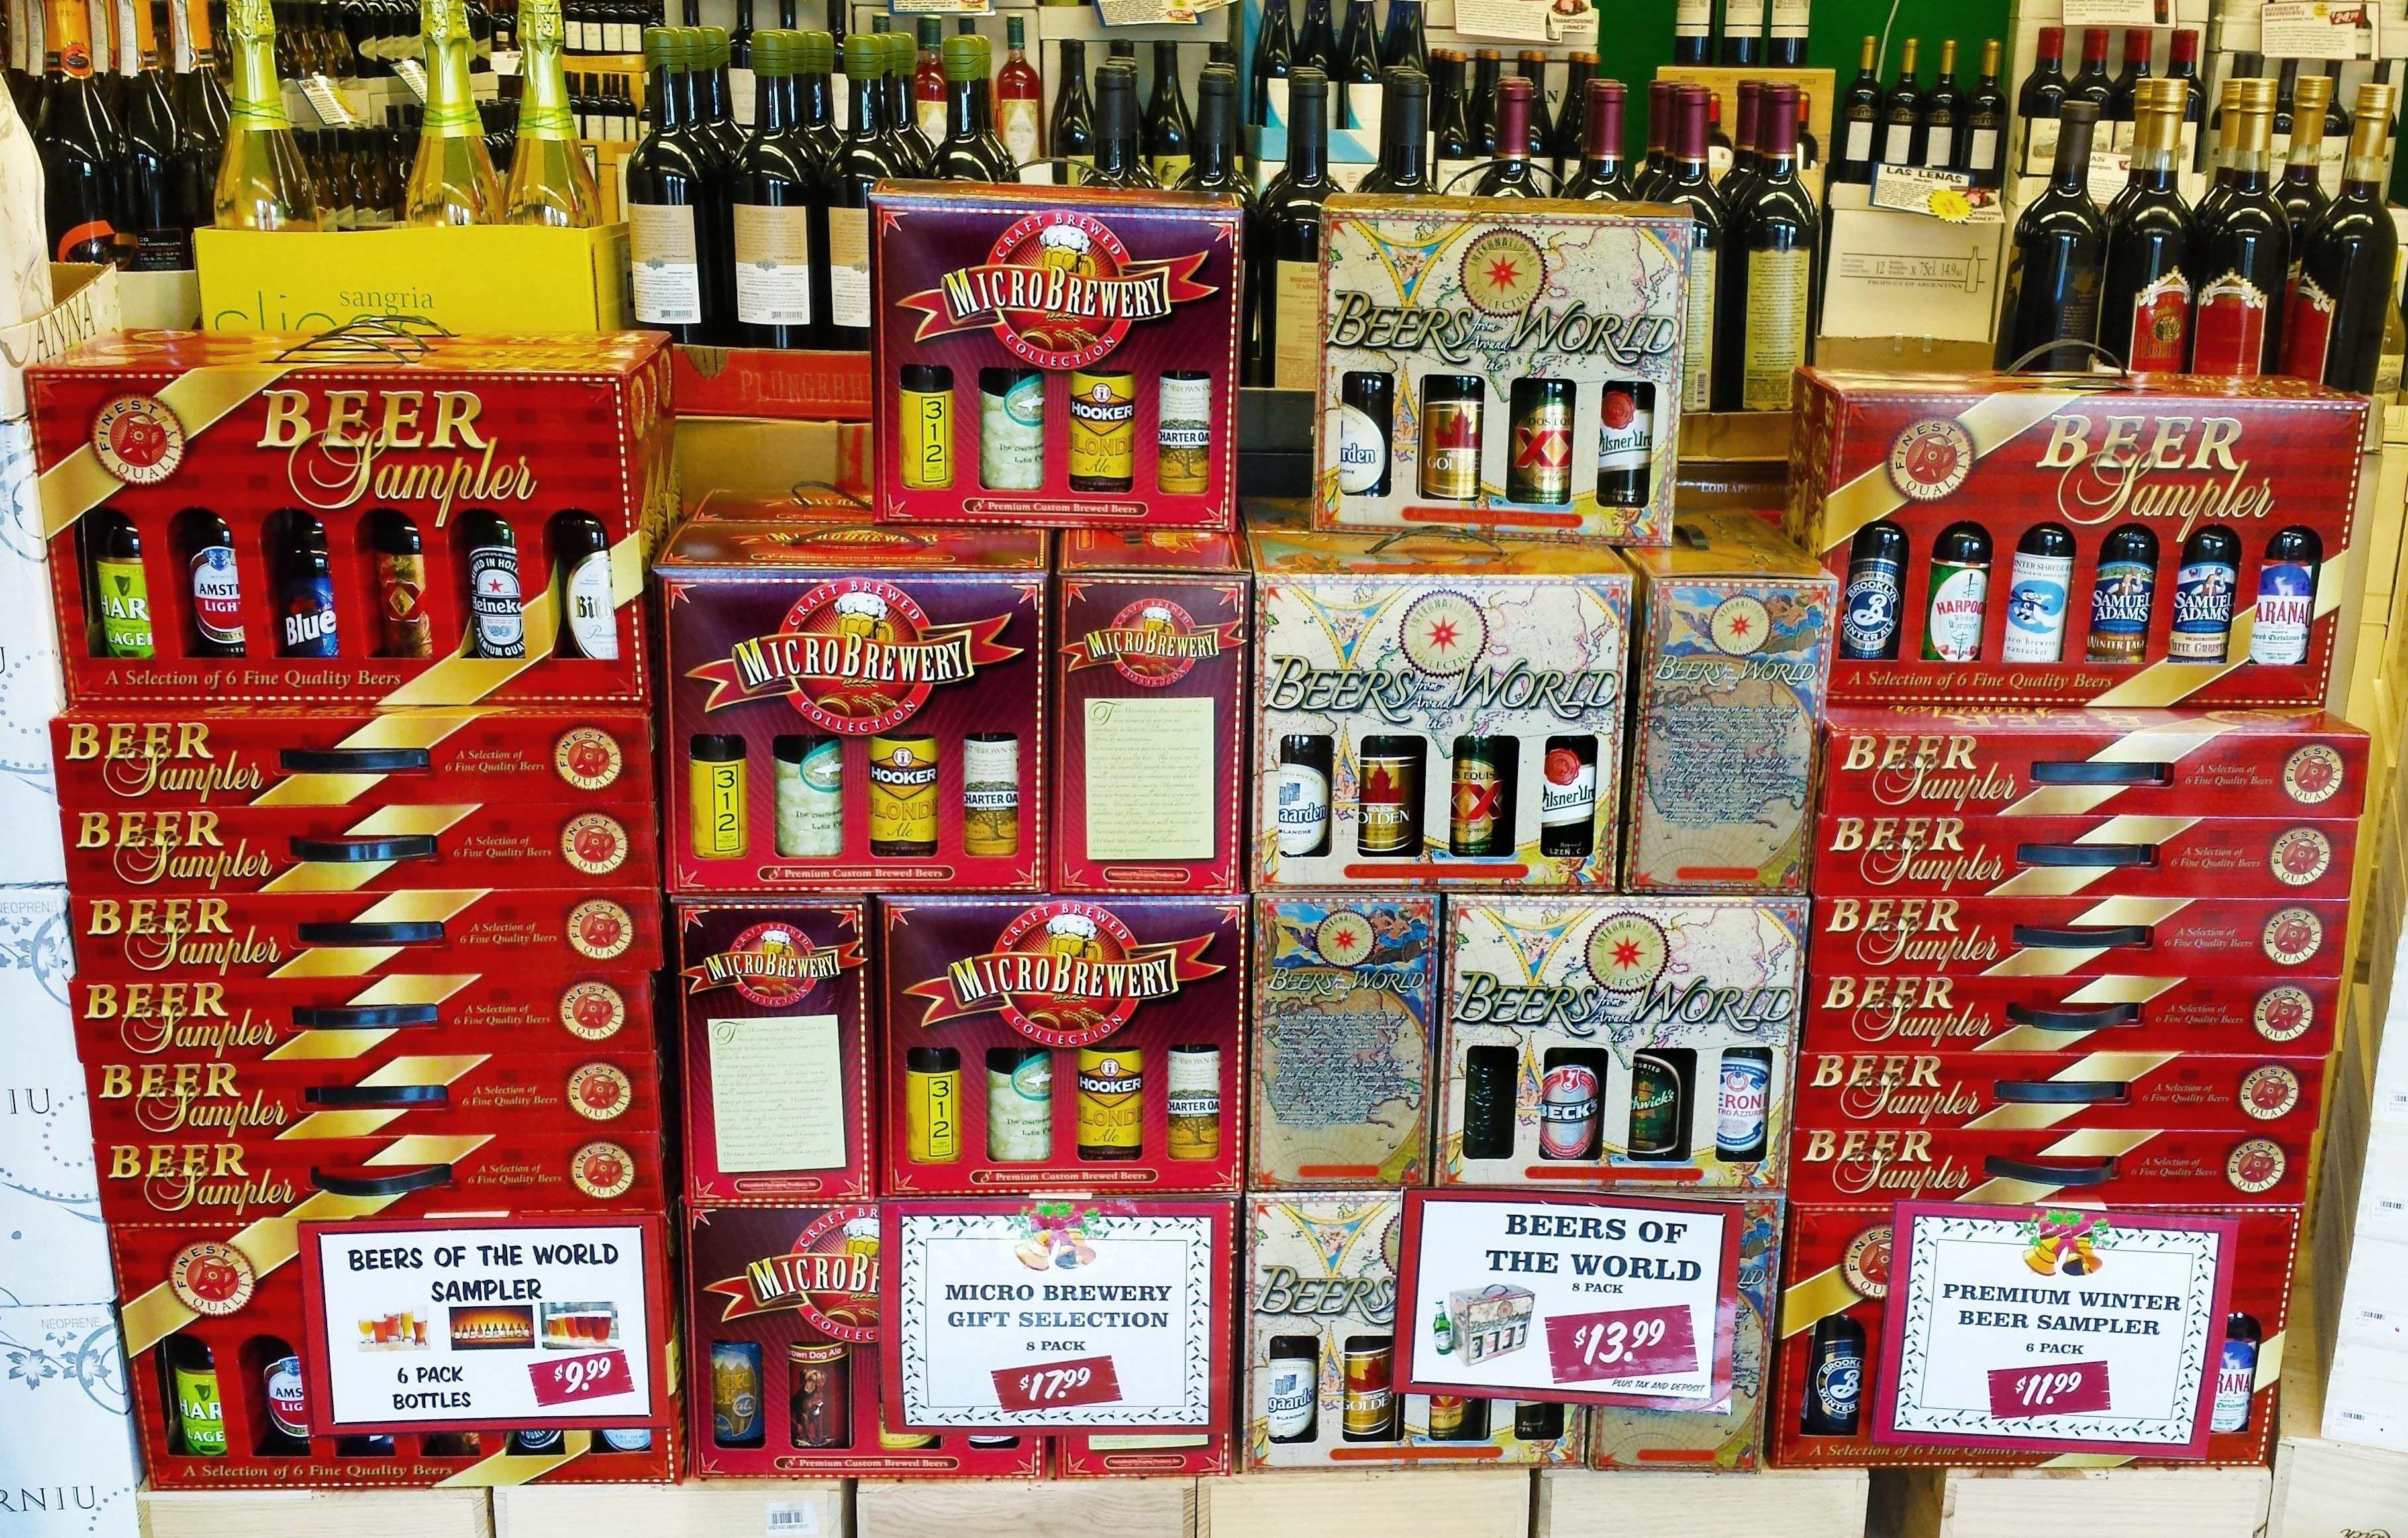 Pin By Wine And Barware On Beer Gifts Ideas Beer Gifts Beer Sampler Beer Lovers